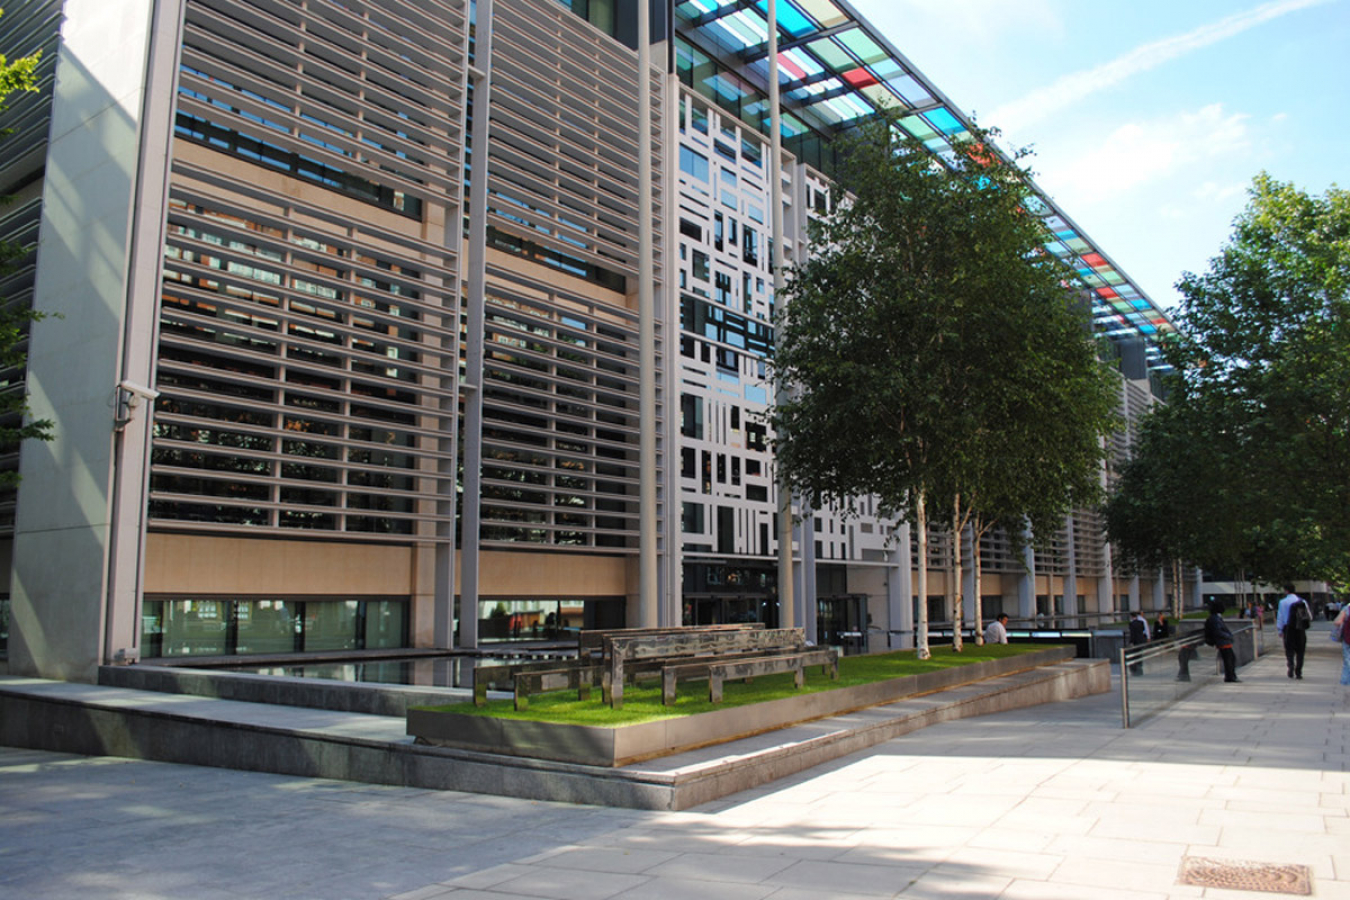 UK Home Office, 2 Marsham Street, London, SW1P